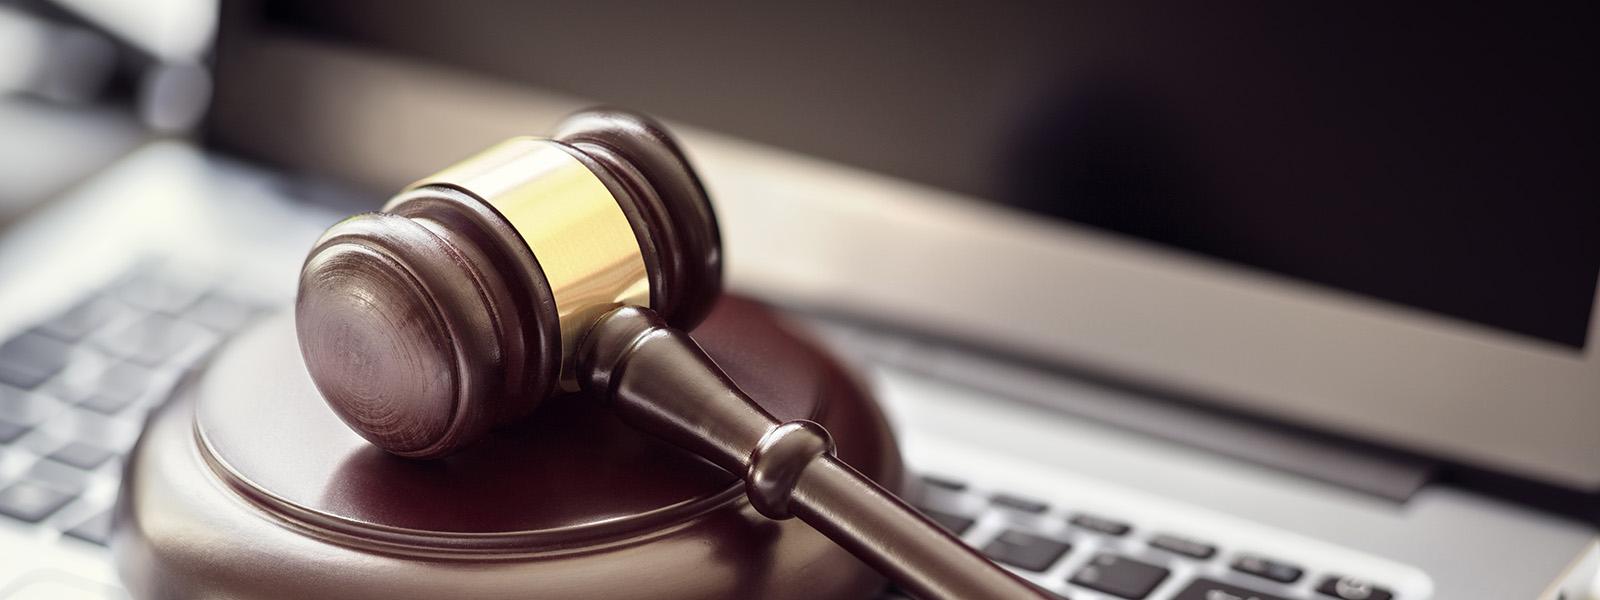 lawyer gavel on top of laptop keyboard